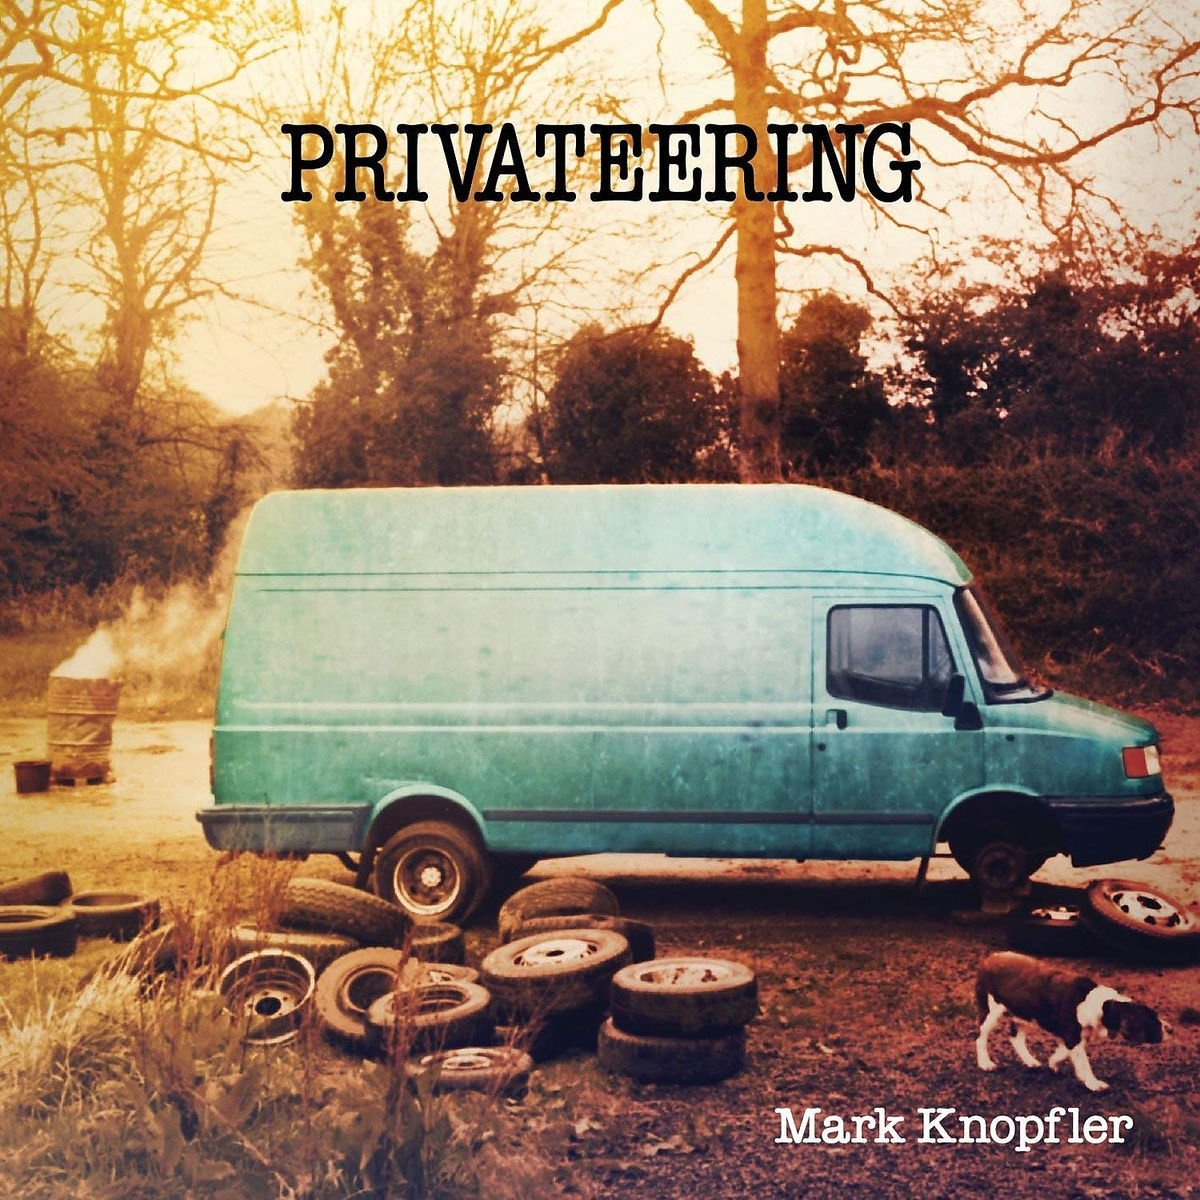 Vinilo : Mark Knopfler - Privateering (Germany - Import)